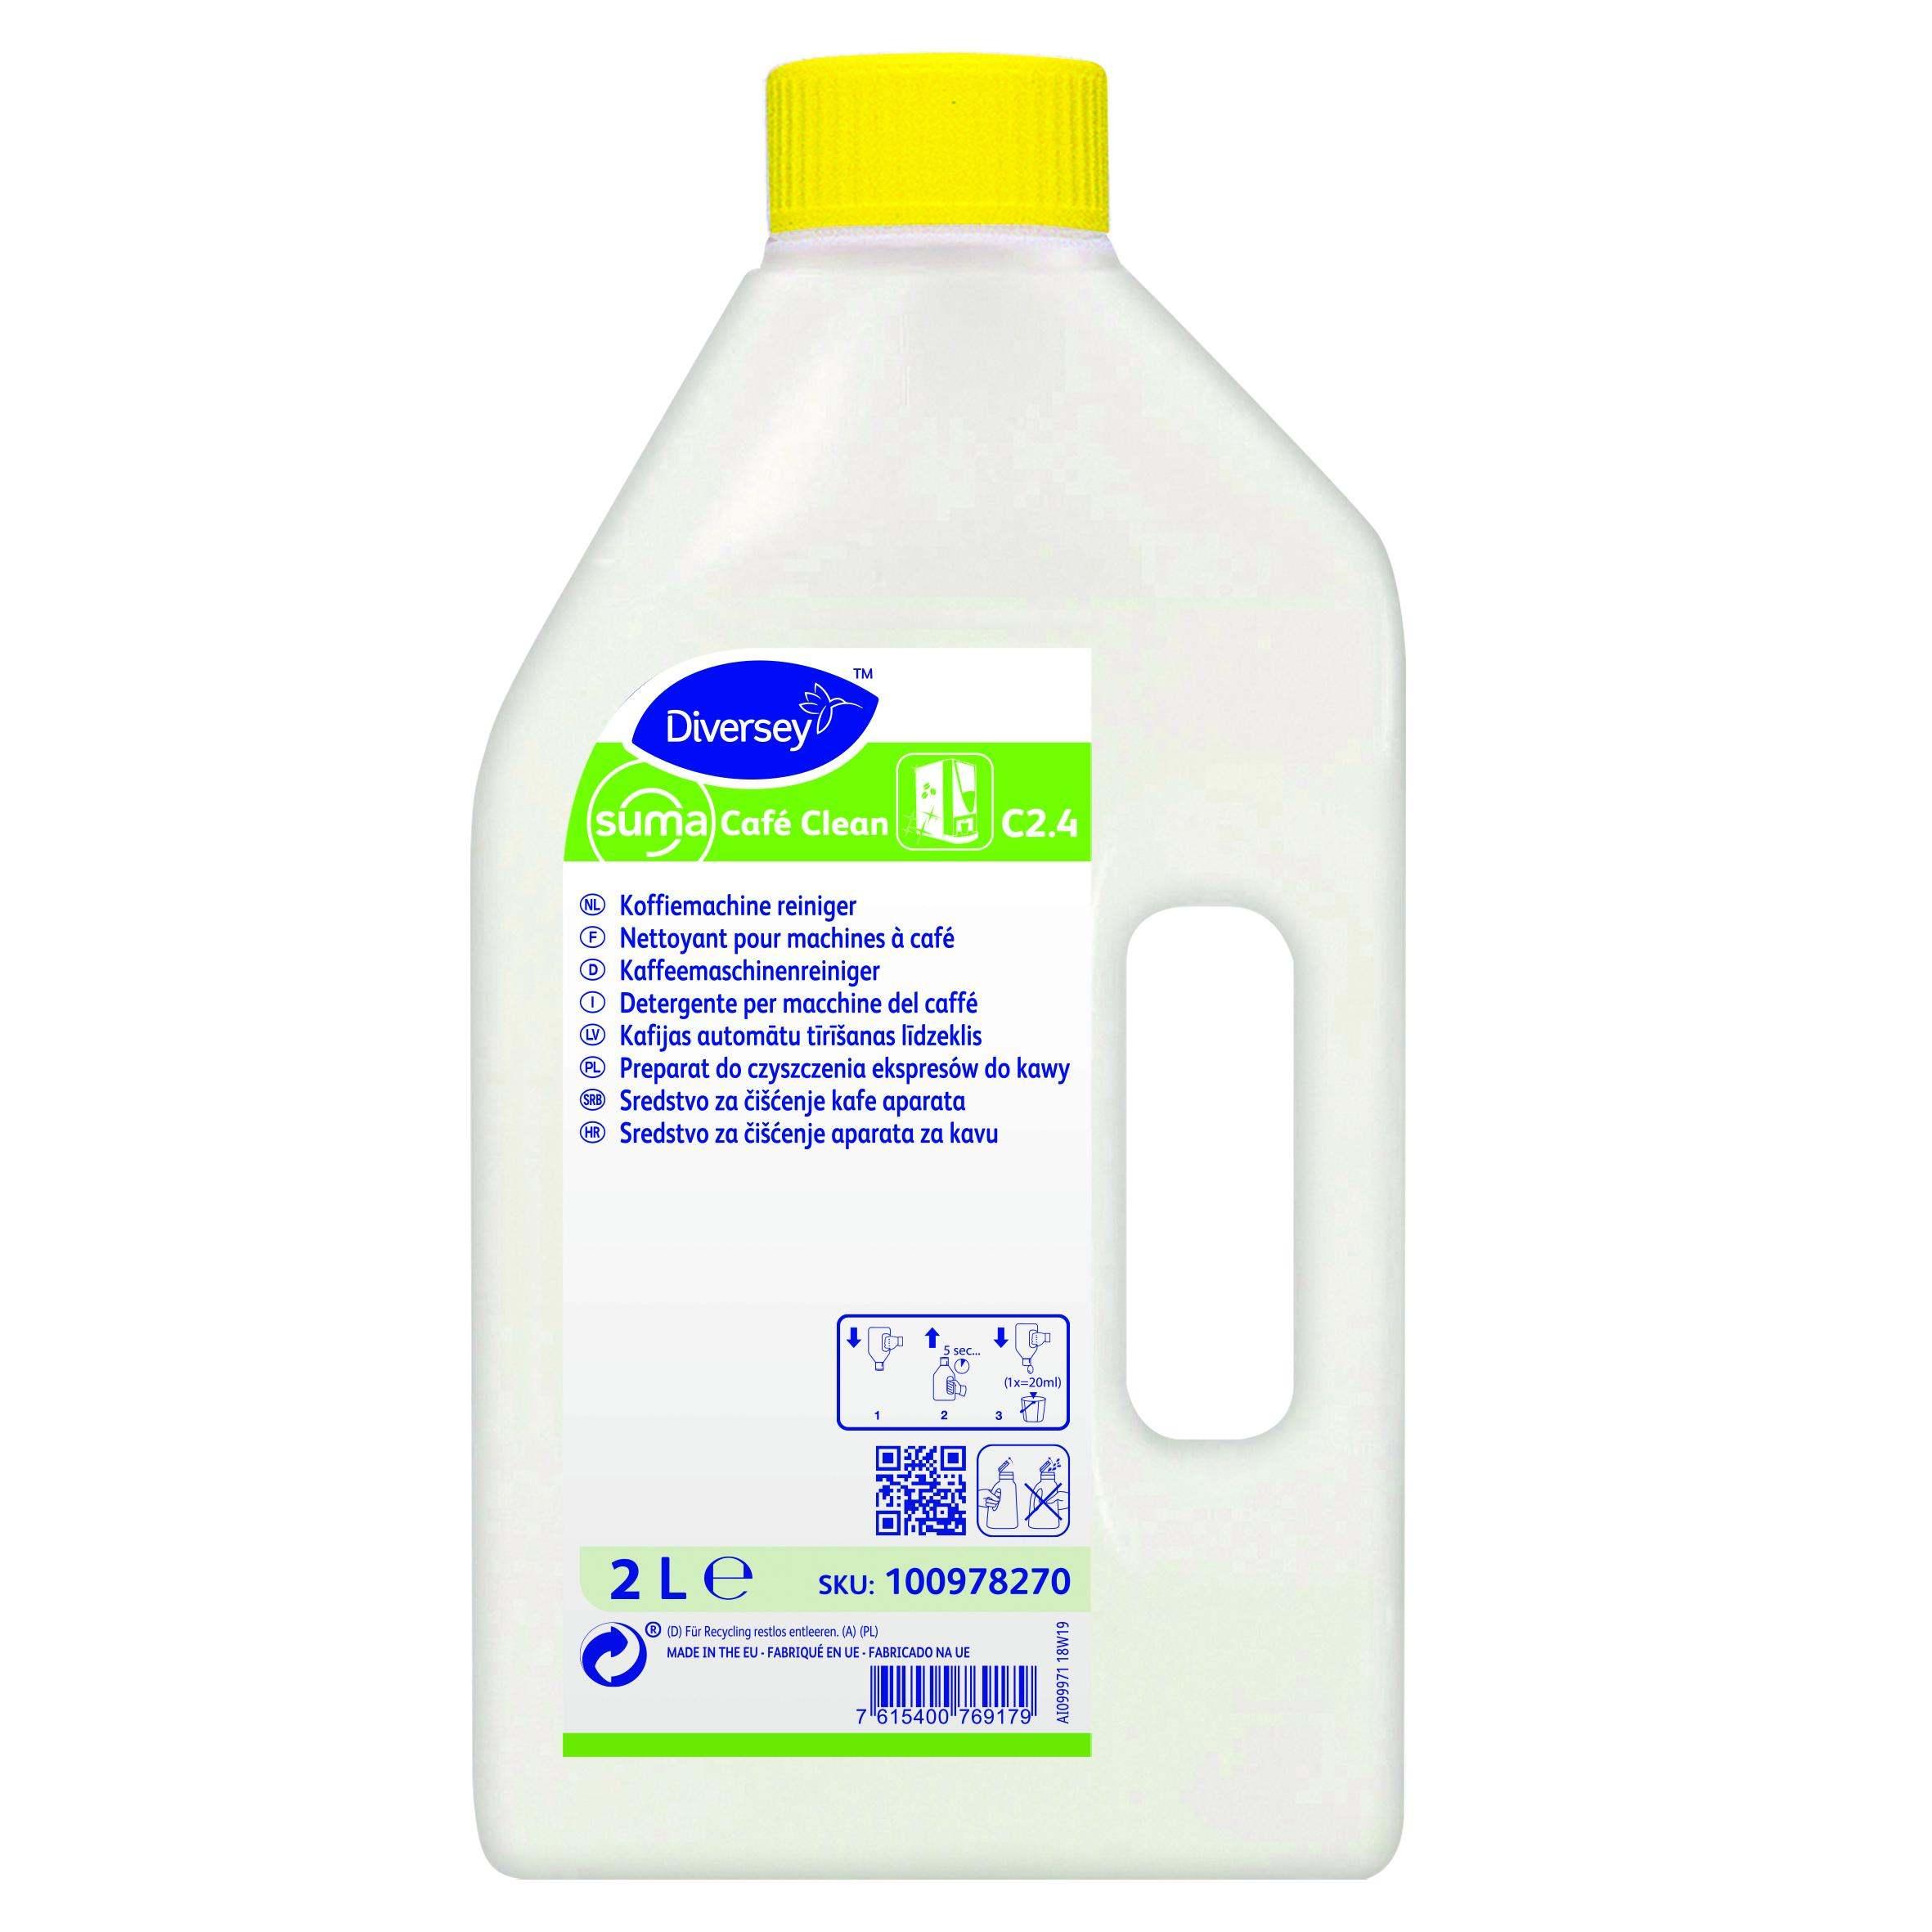 100978270-Suma-Café-Clean-C2.4-2x2L-CMYK-20x20cm-(1).jpg